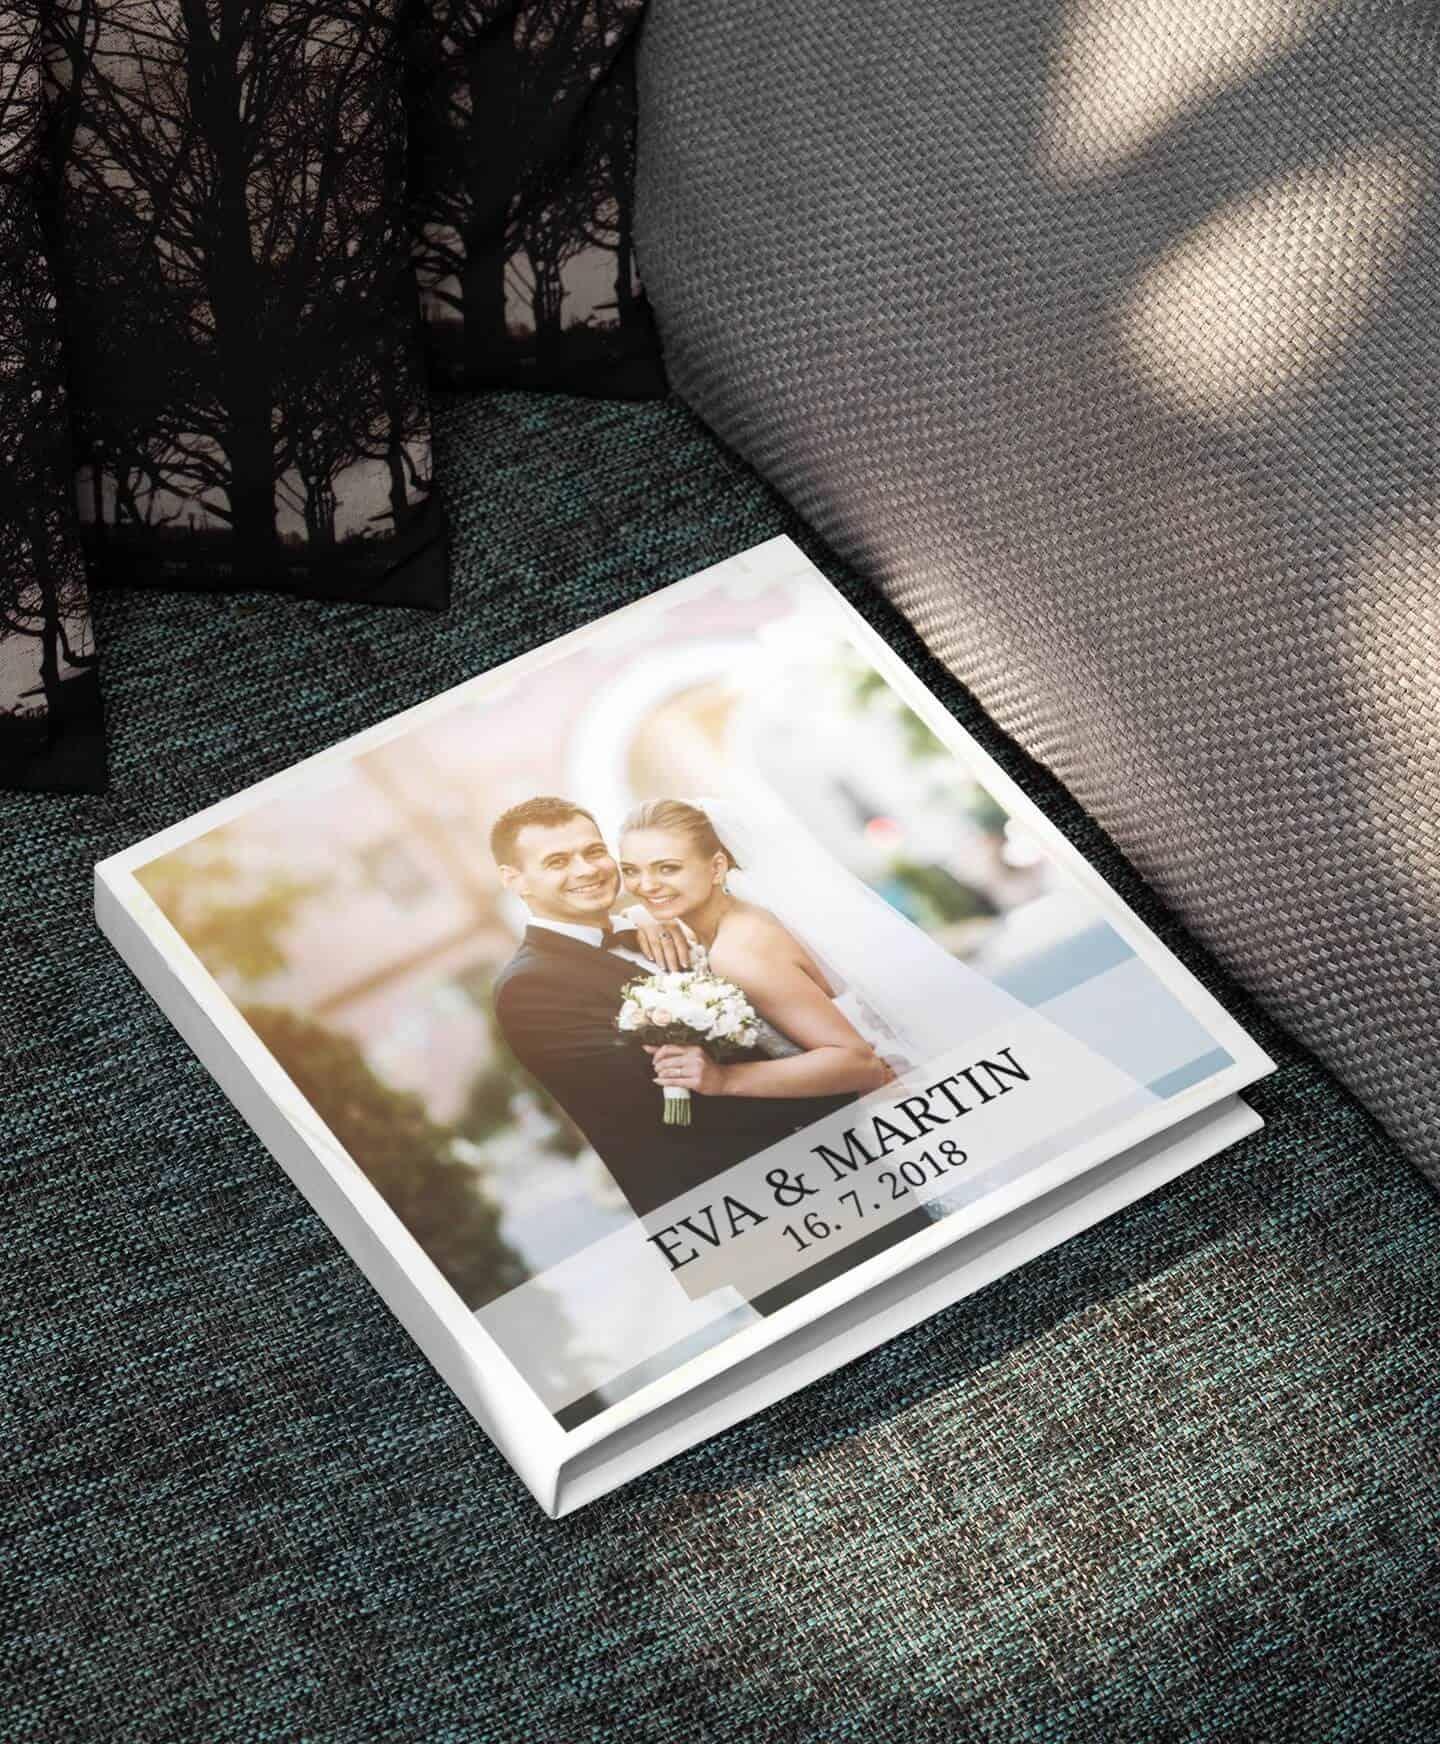 Svatební fotokniha ALTU, Eva a Martin